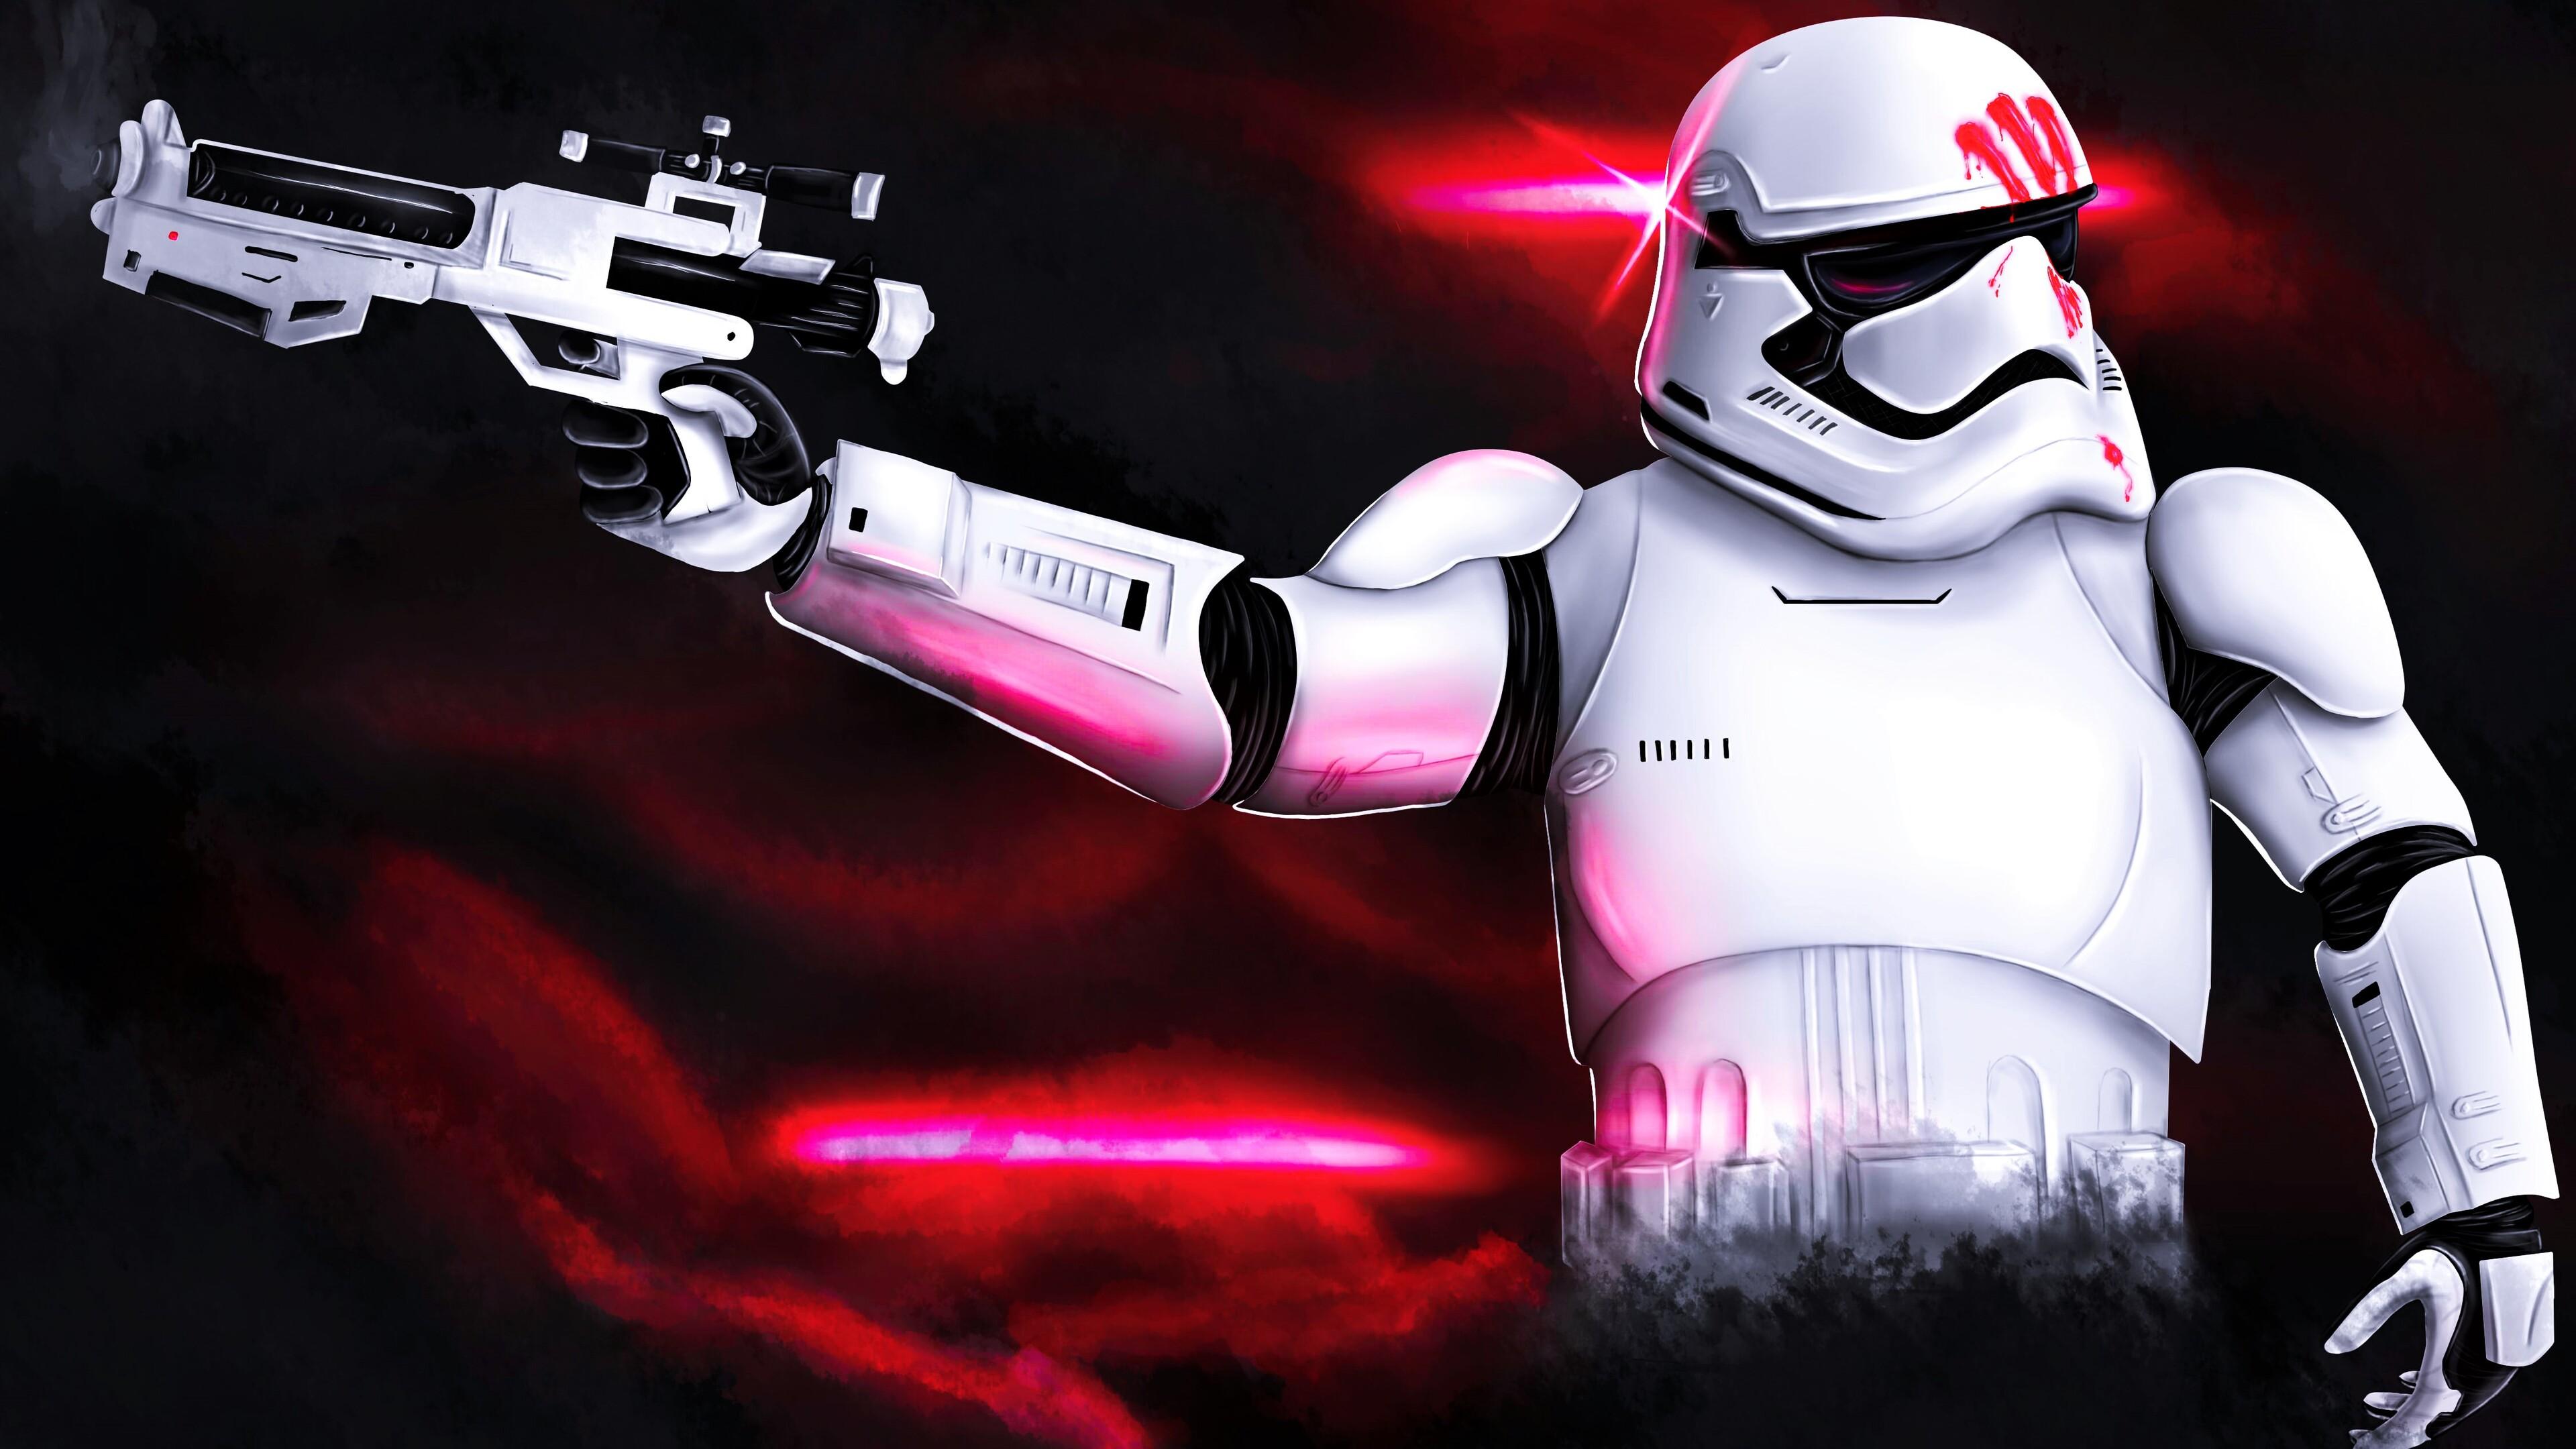 clone-trooper-star-wars-4k-yj.jpg